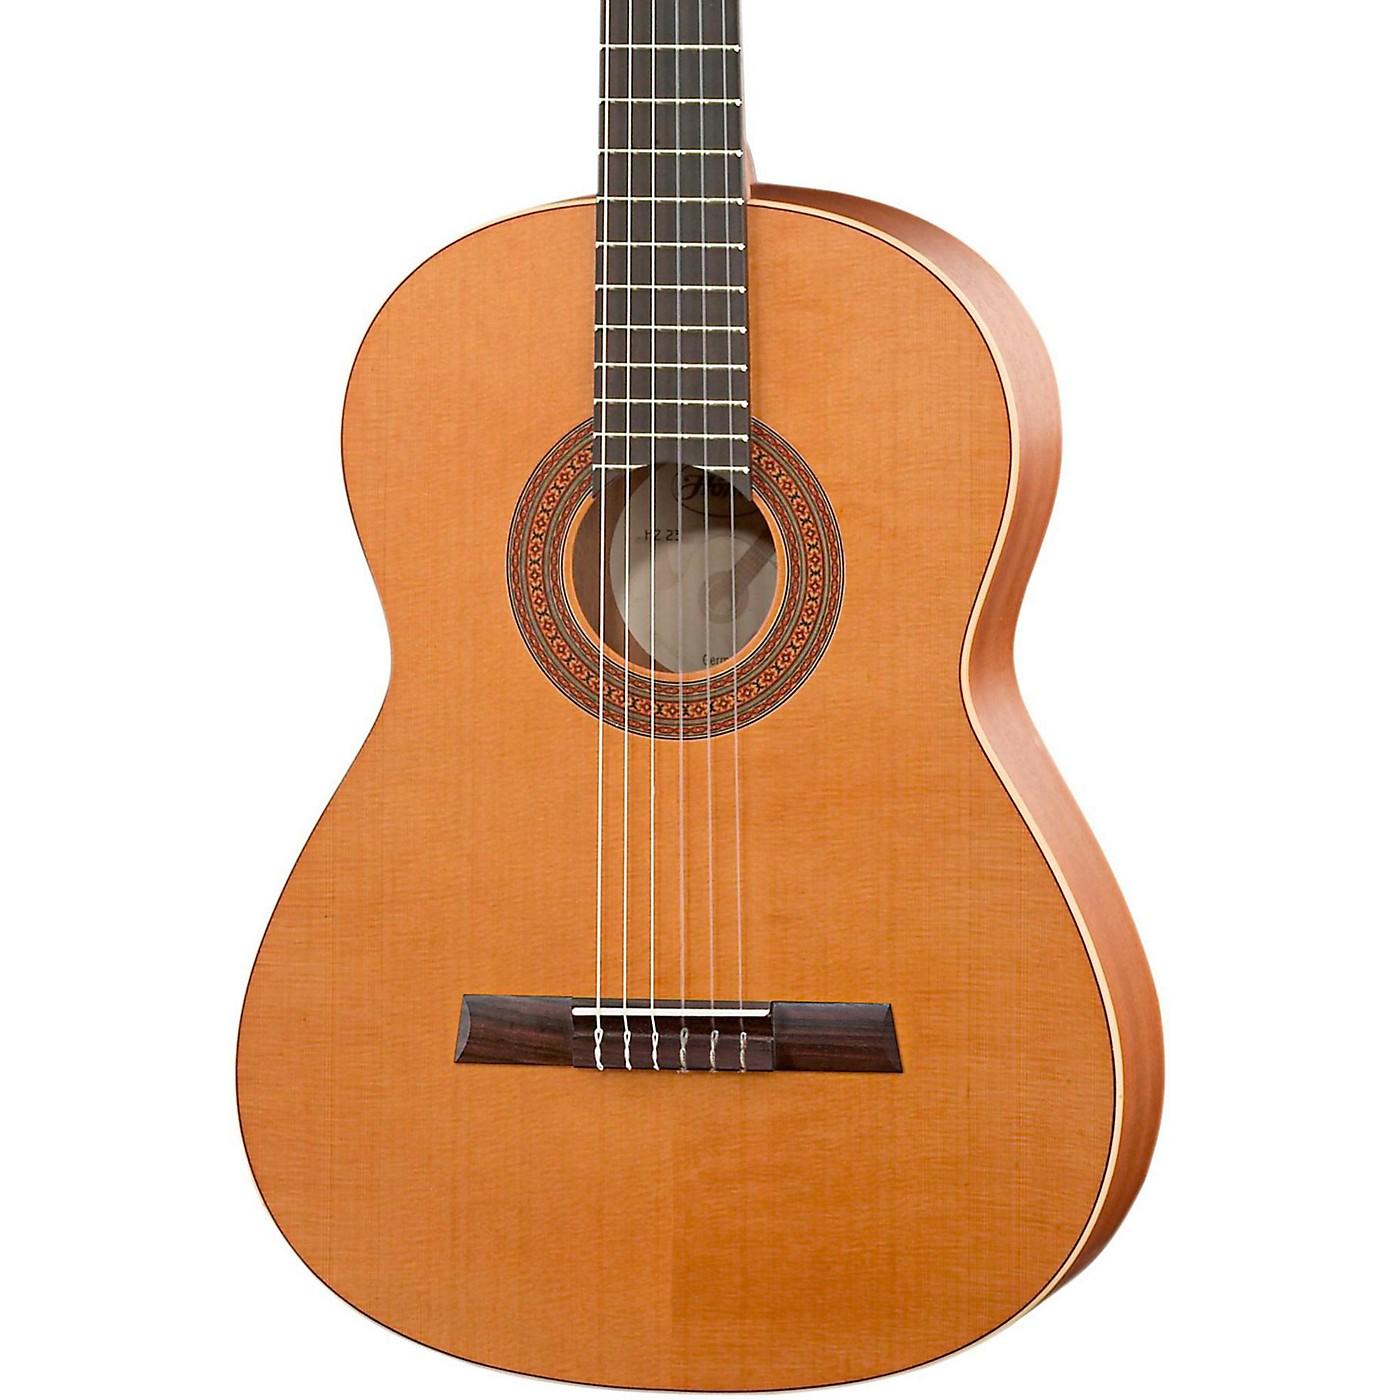 Hofner Solid Cedar Top Mahogany Body Classical Acoustic Guitar thumbnail